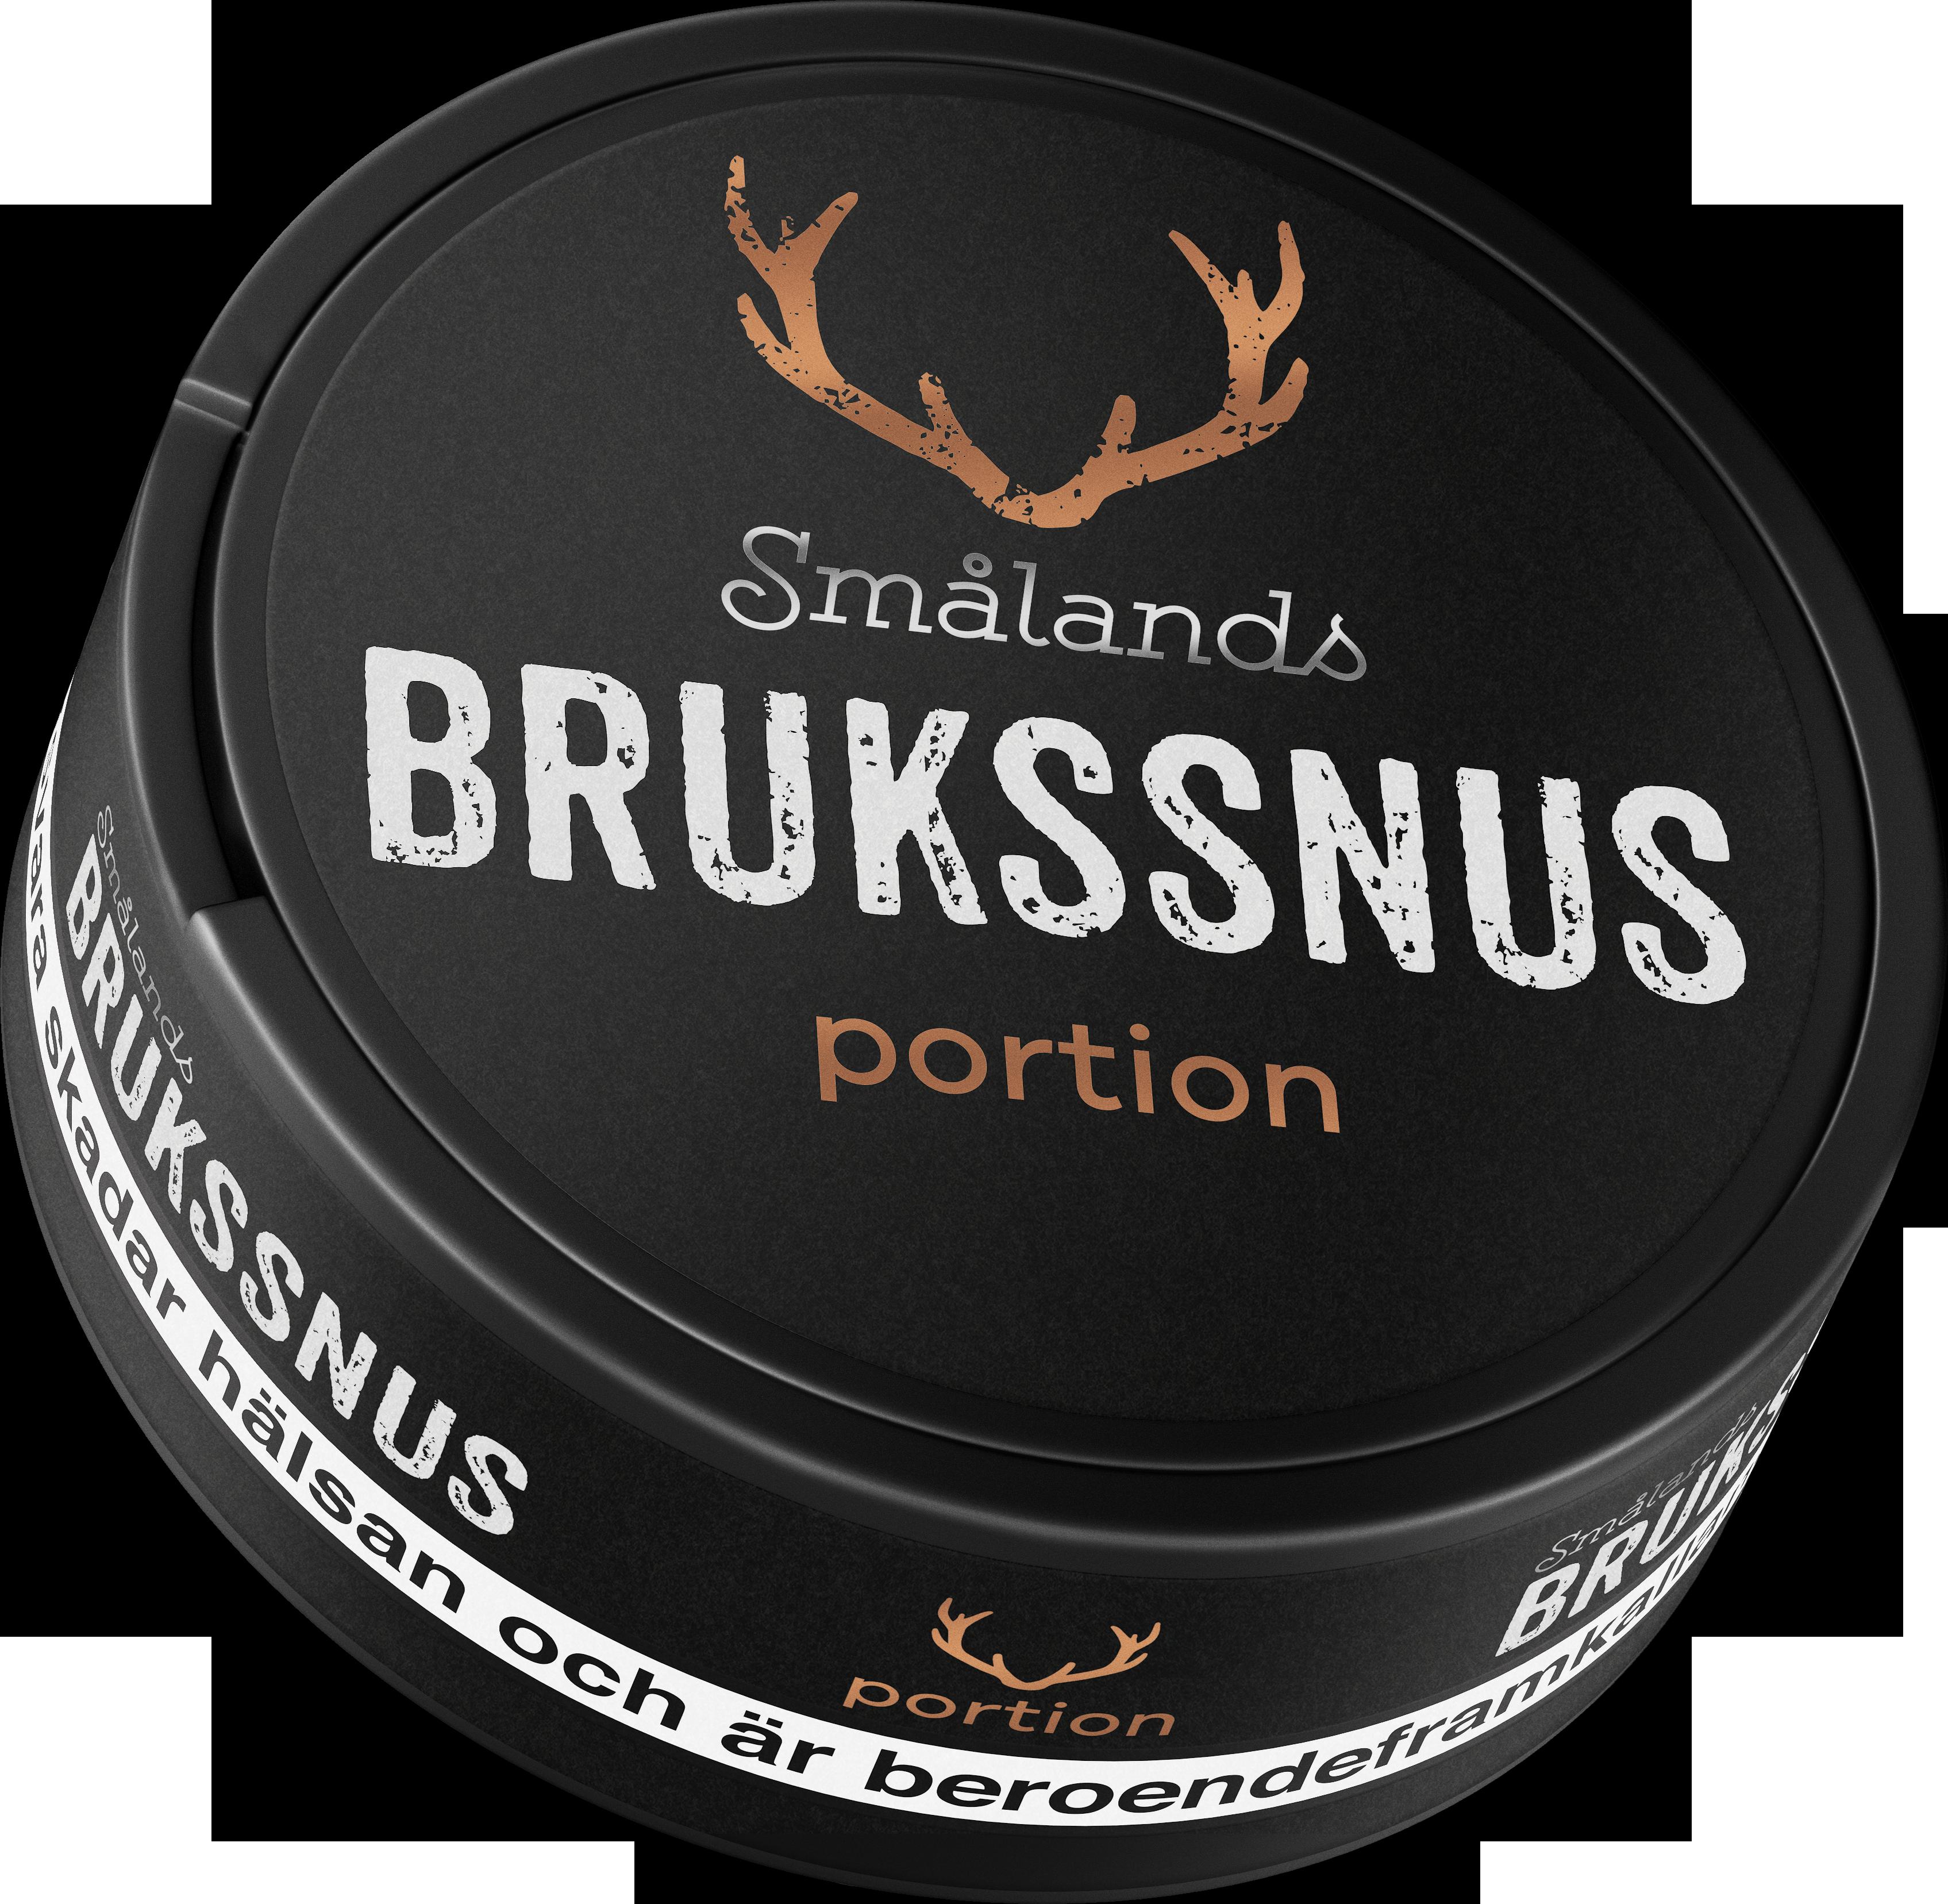 Smålands Brukssnus